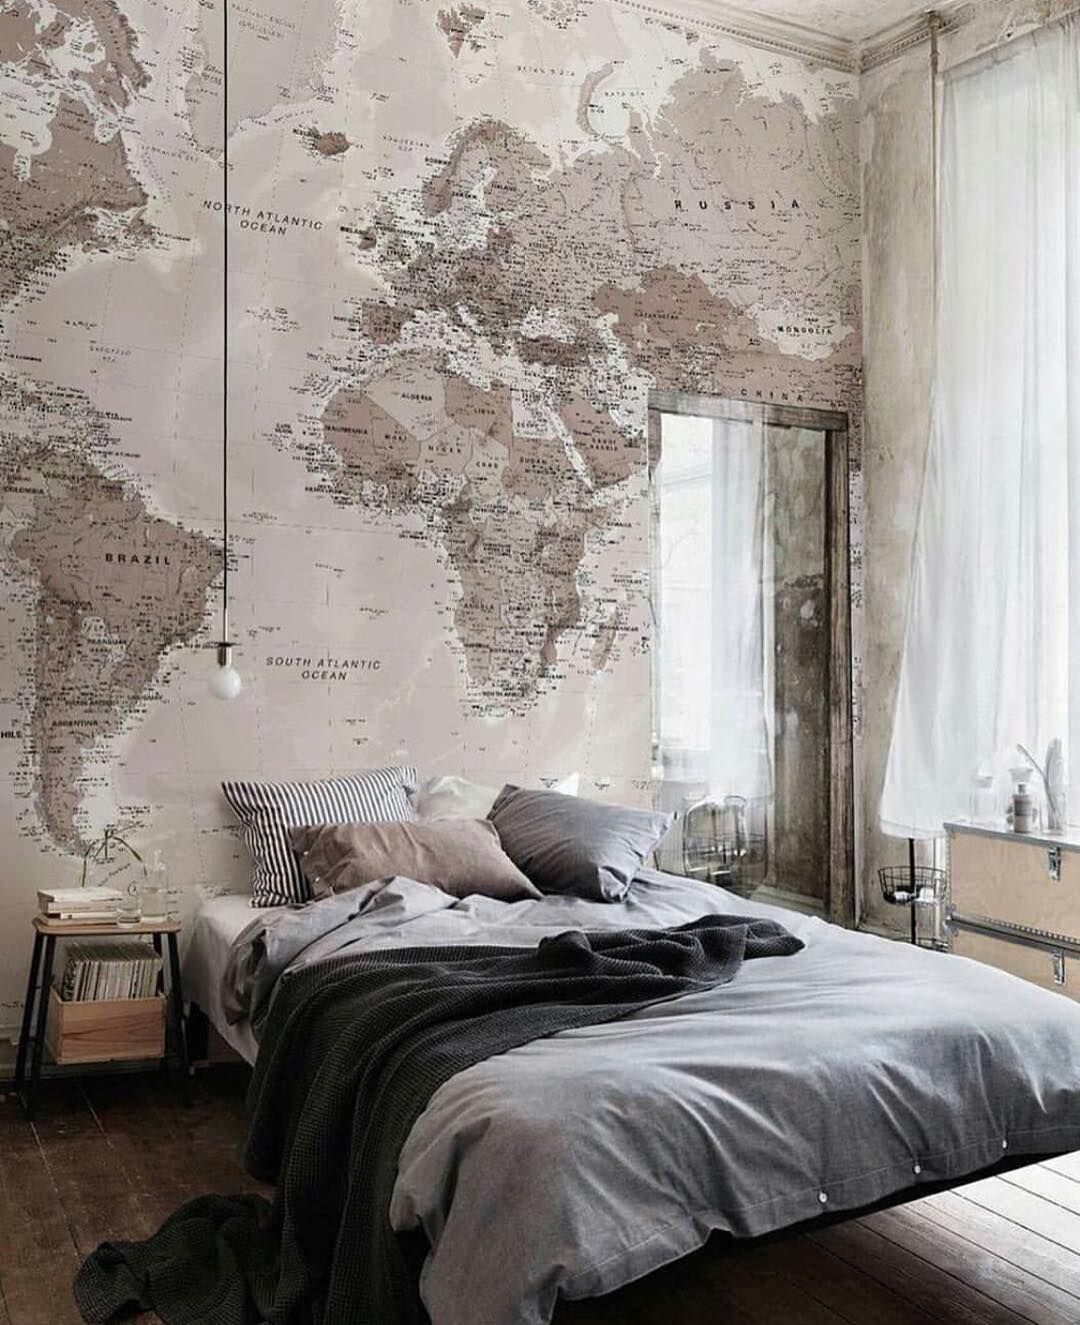 The World is yours #bedroom #interior #interiordesign by myinterior